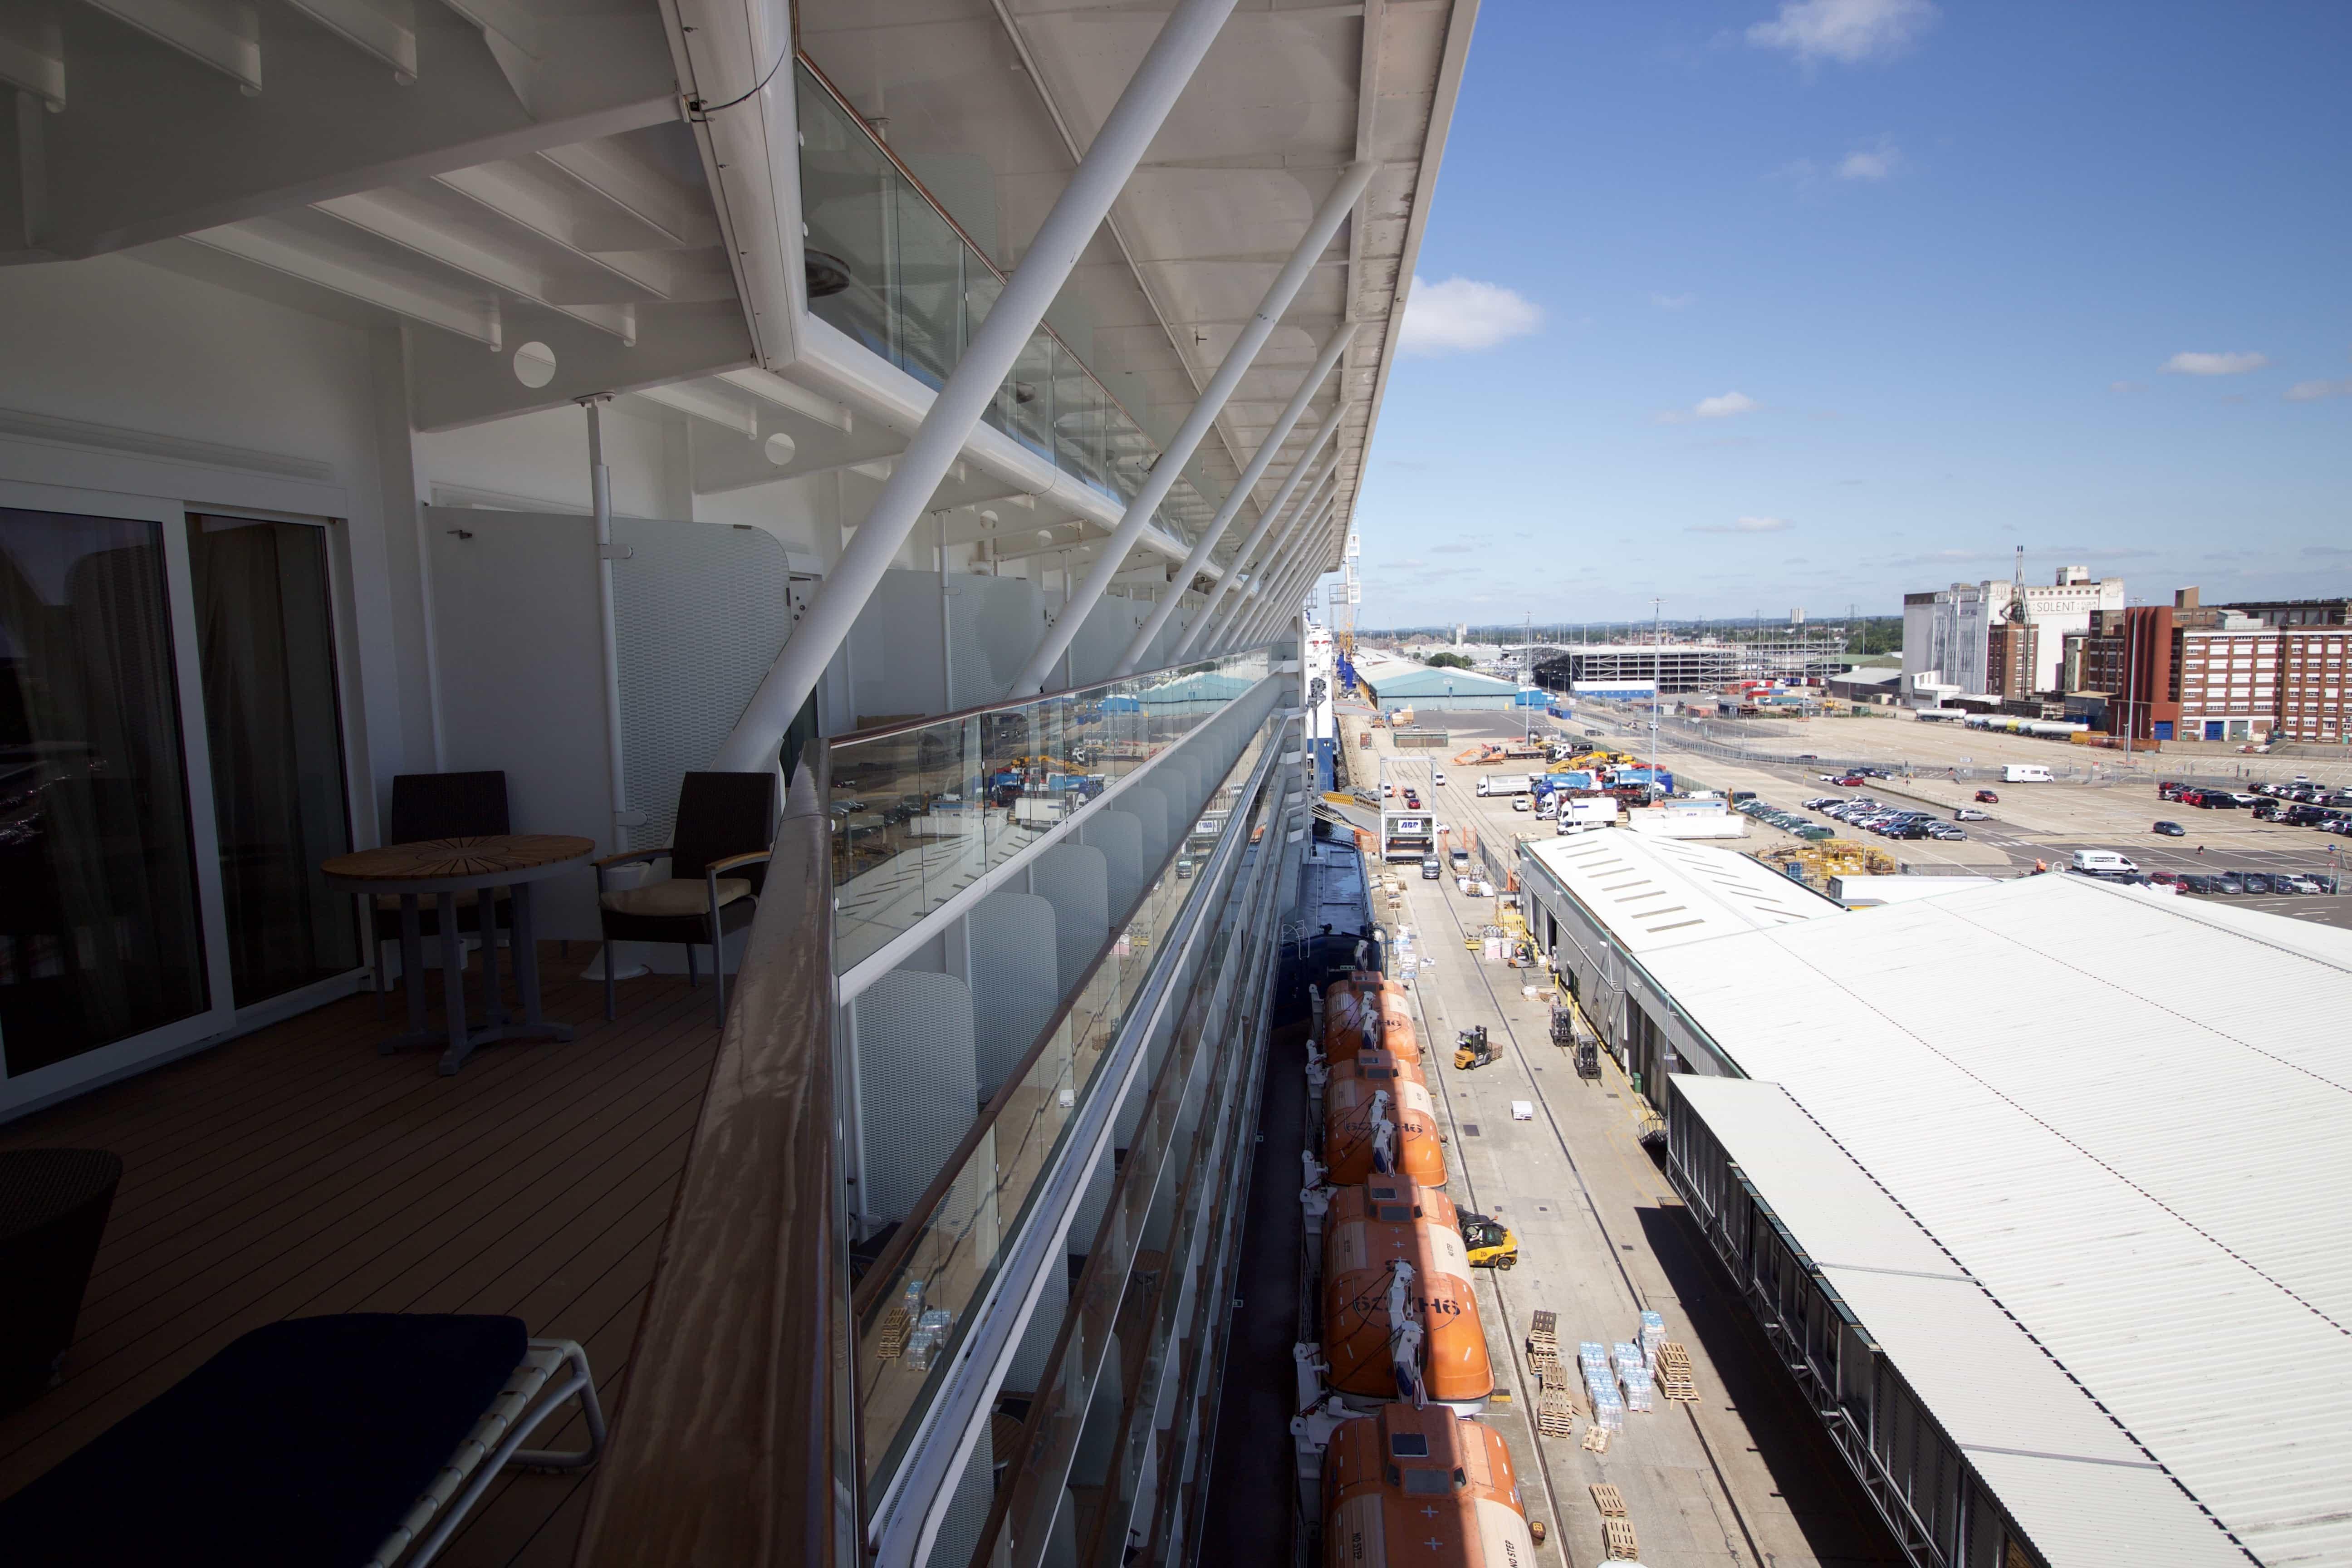 Celebrity Eclipse side of ship cruise ship life boats southampton dock port